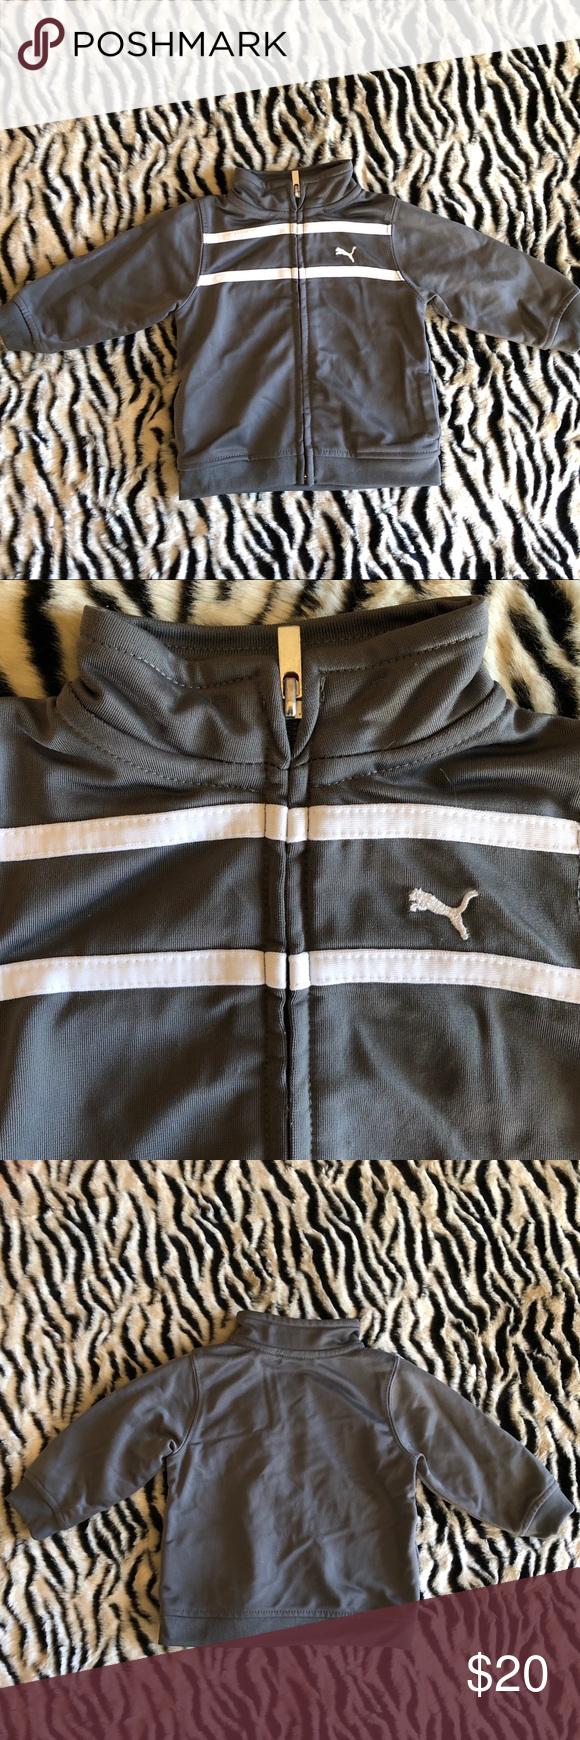 f2ed21c91f5d Baby Puma Sport Lifestyle Gray Track Jacket Baby Puma Sport Lifestyle Gray  Track Jacket. Size 3-6M. Puma Jackets   Coats